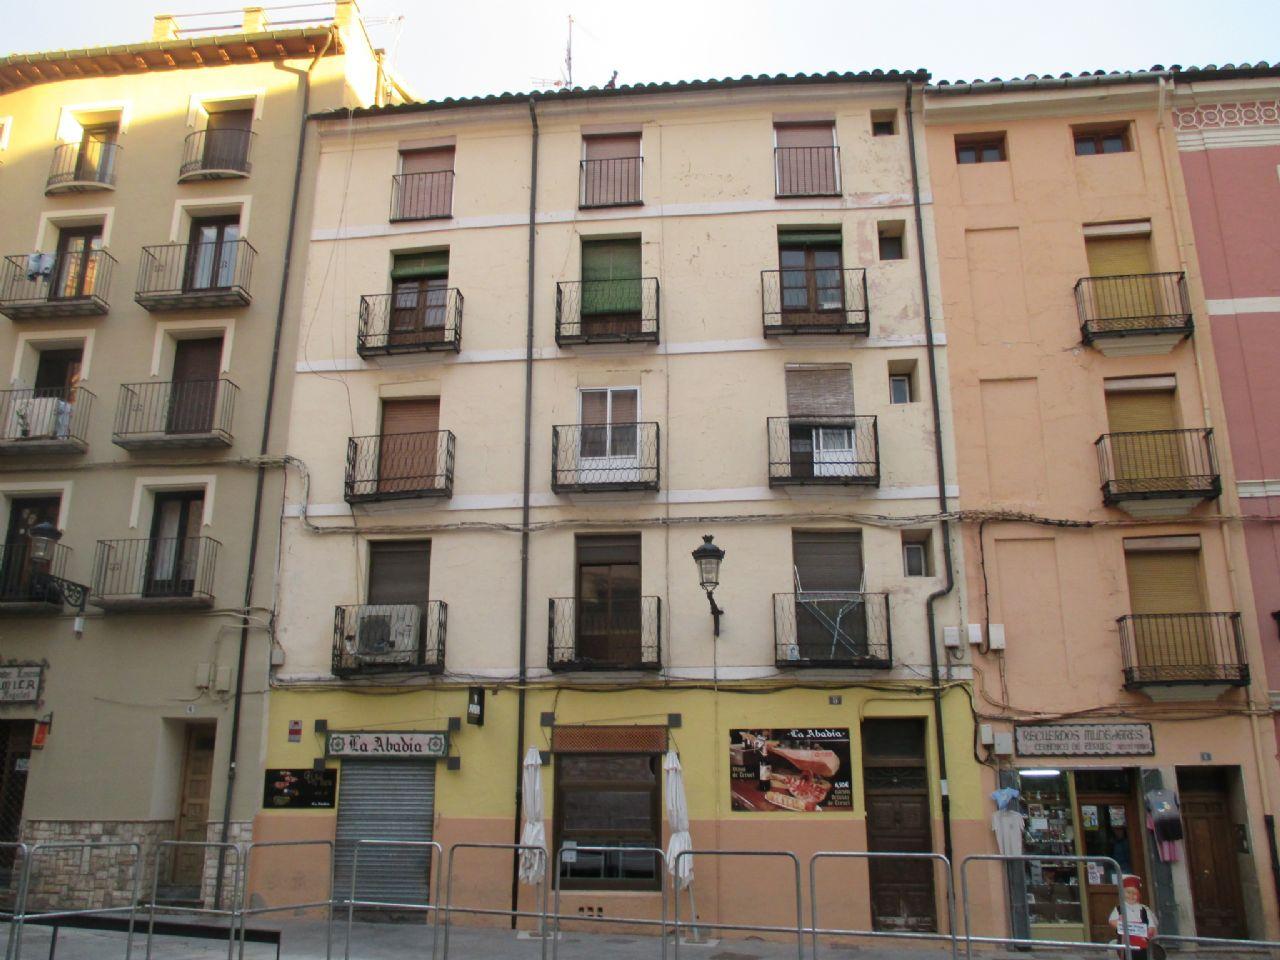 Flat in Teruel, Centro, for sale